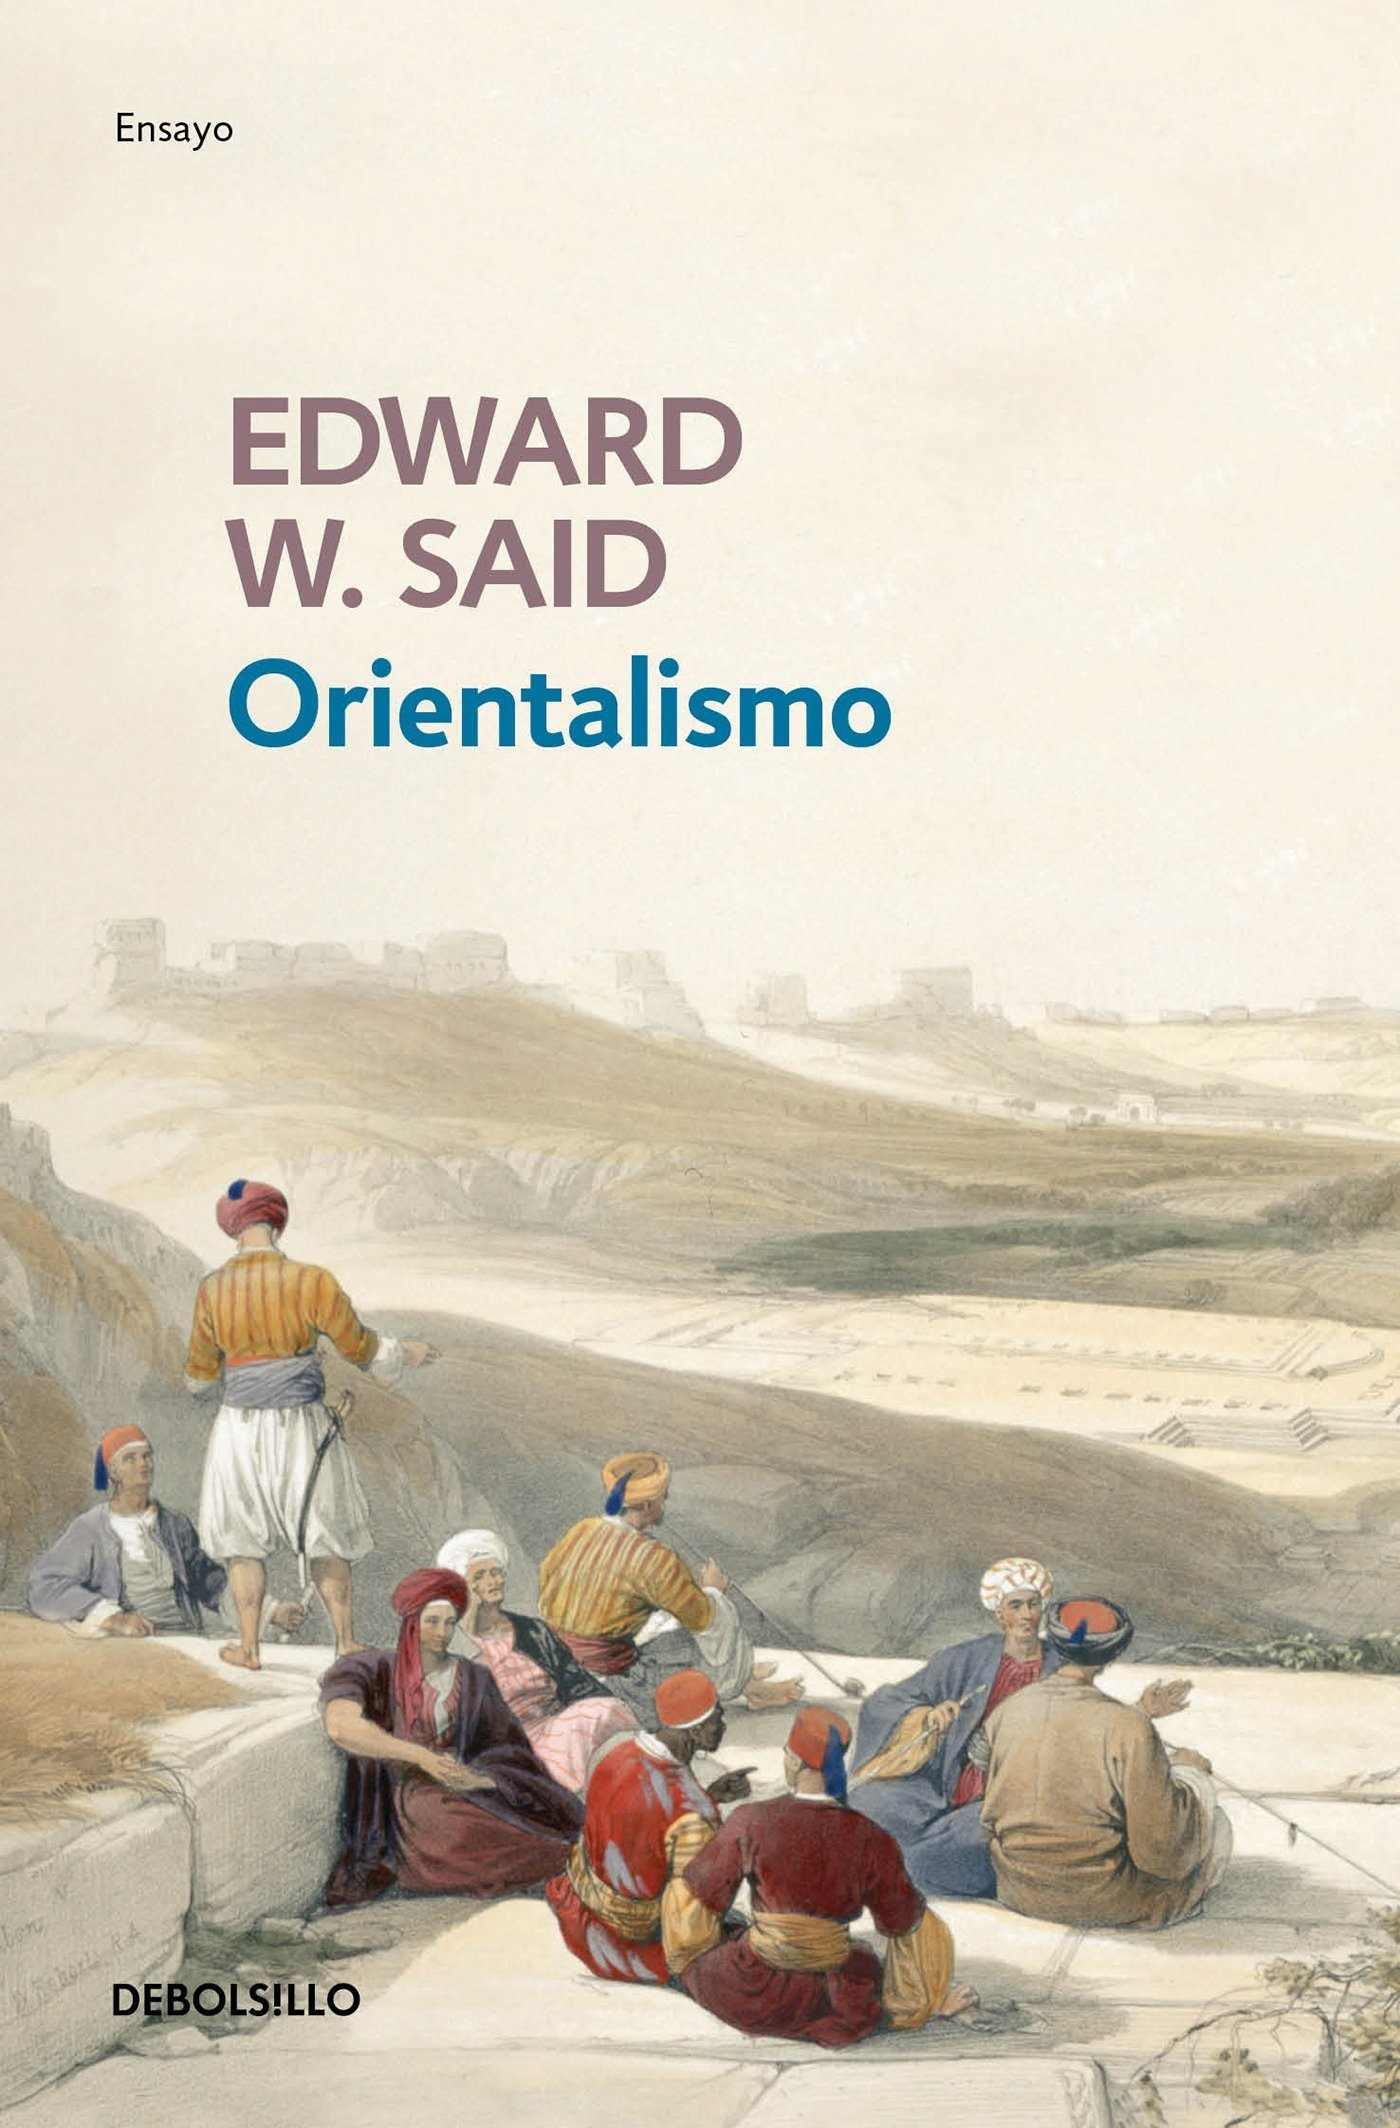 orientalismo said